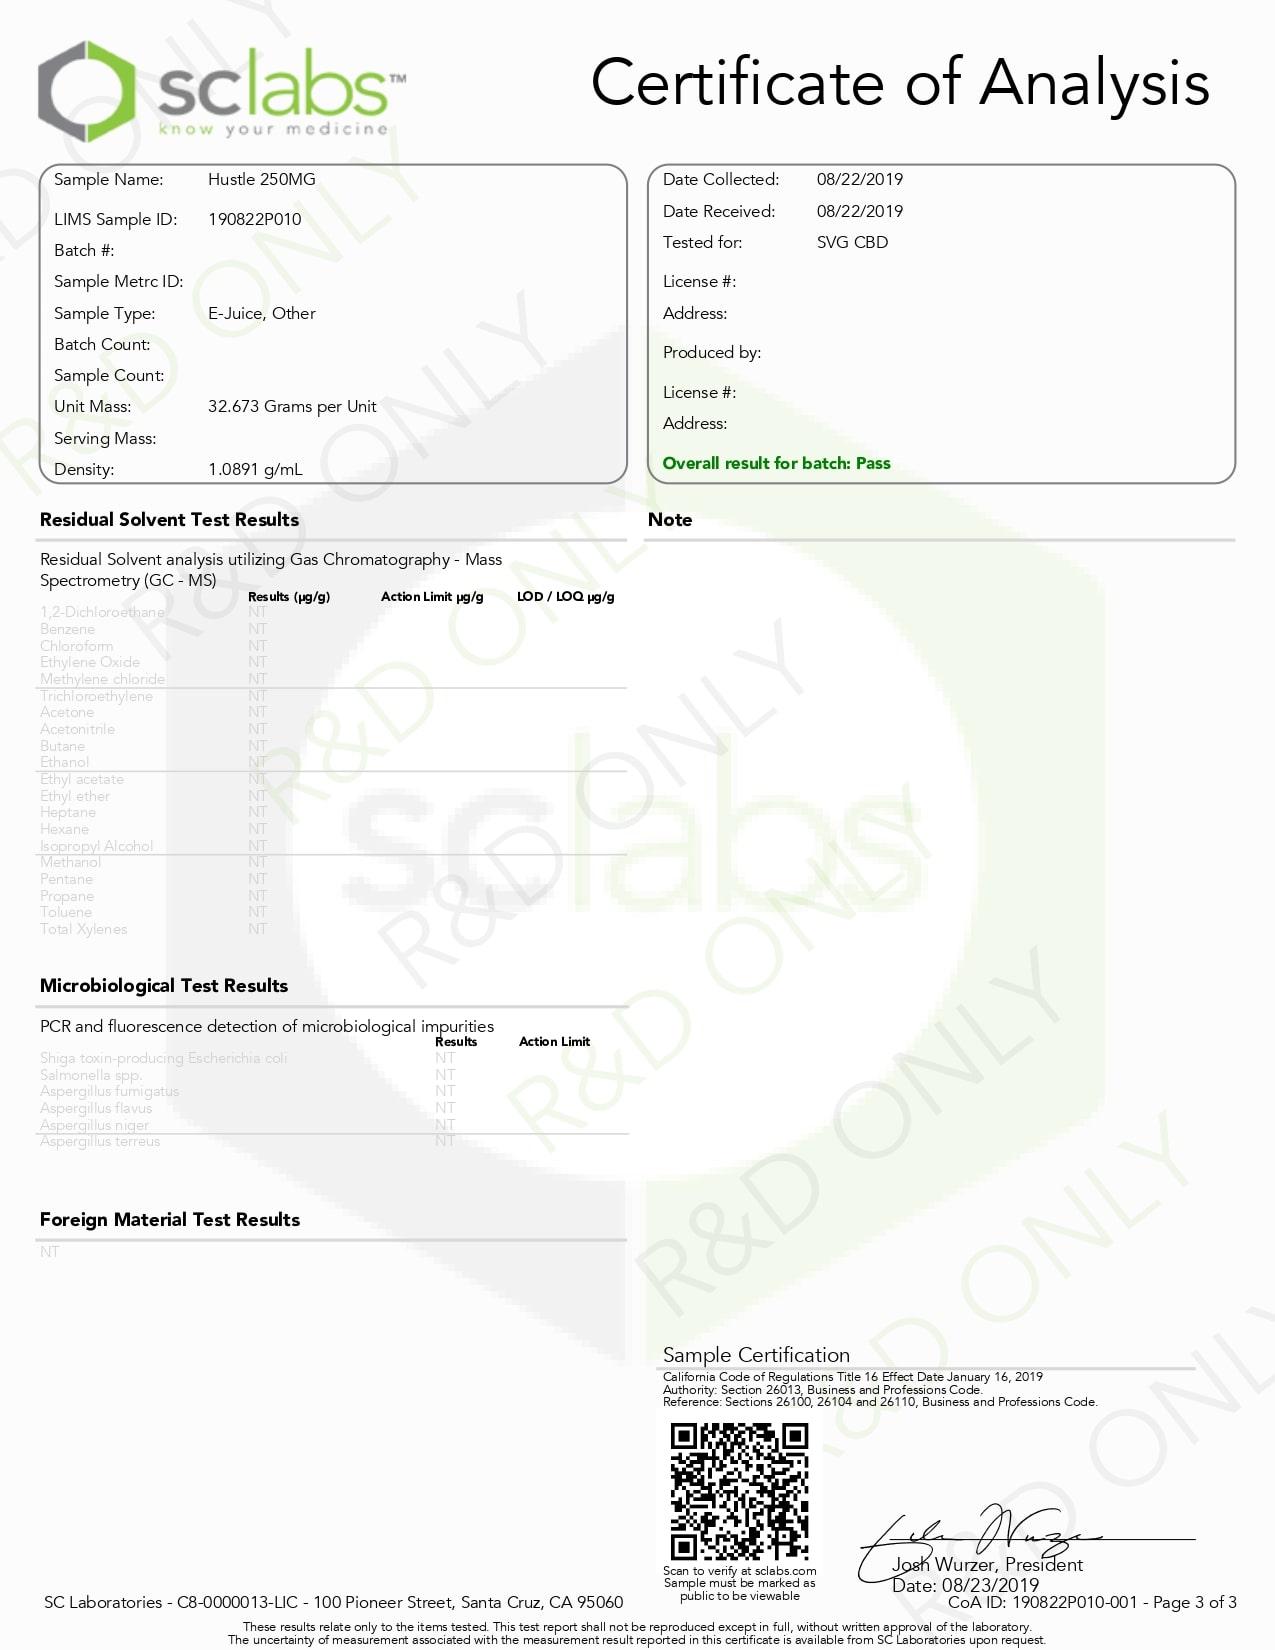 SAVAGE Hustle CBD Vape Juice 500mg Lab Report